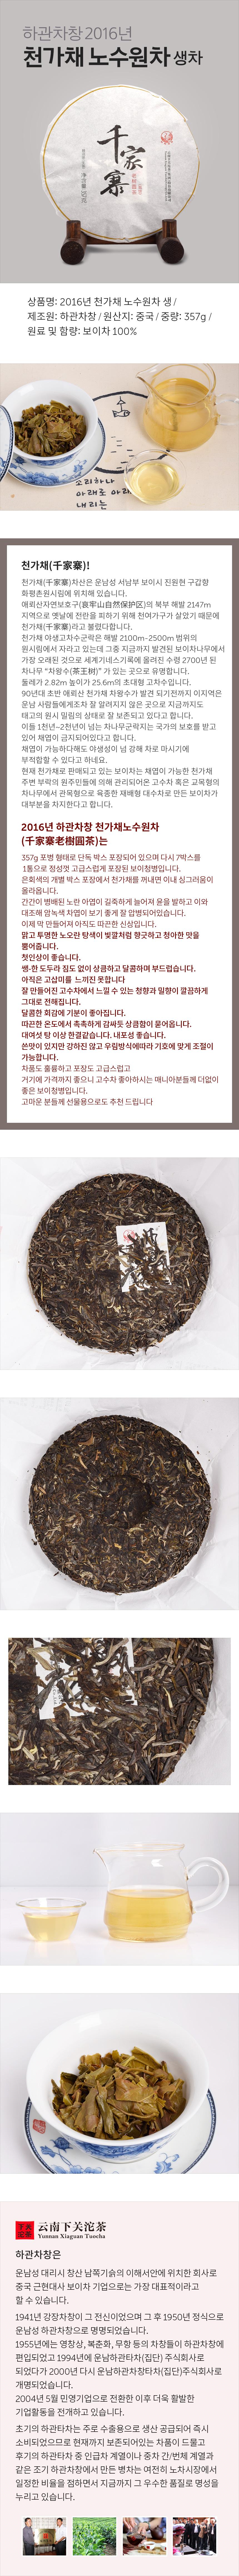 [ HagwanChaChang ] [HAGWANCHACHANG]2016 Chungachae Nosuwon Tea 357g